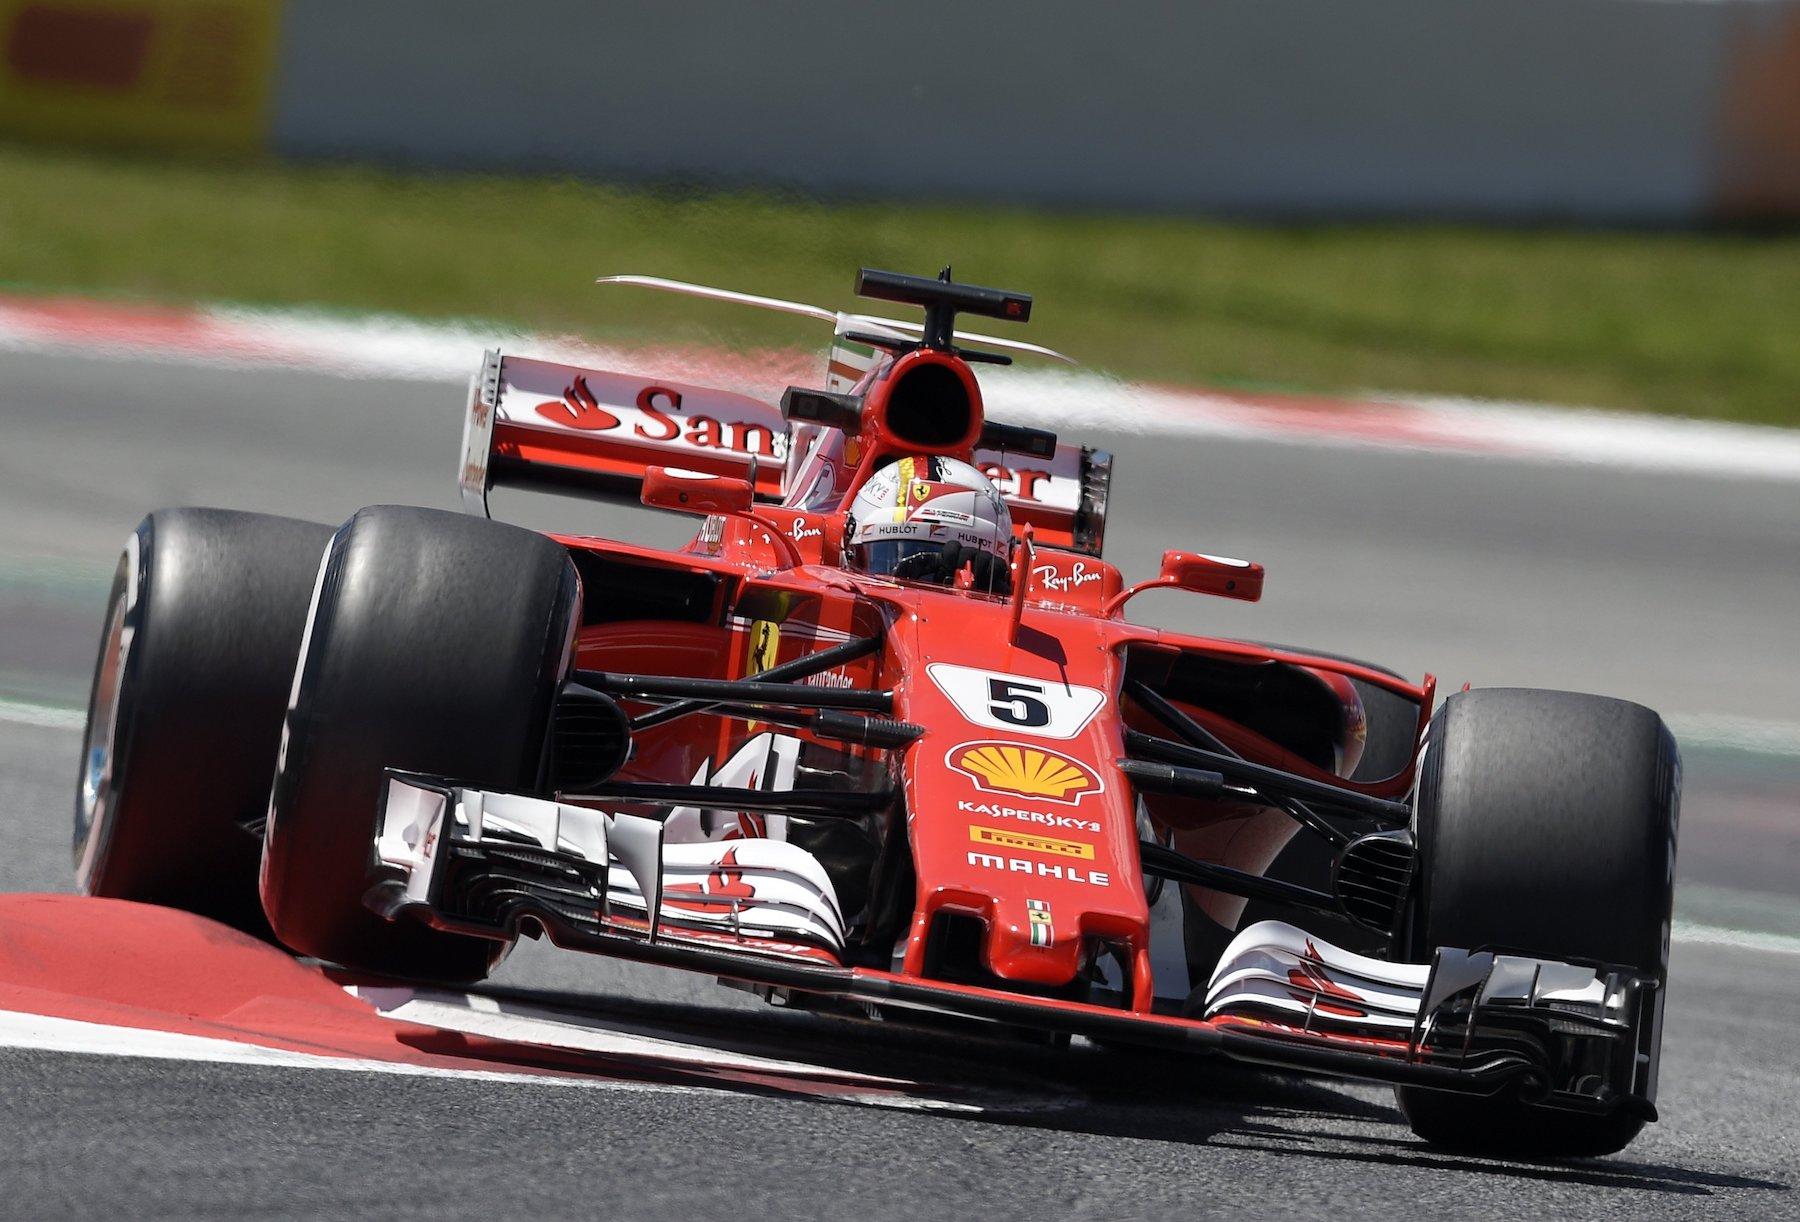 2017 Sebastian Vettel | Ferrari SF70H | 2017 Spanish GP FP2 1 copy.jpg